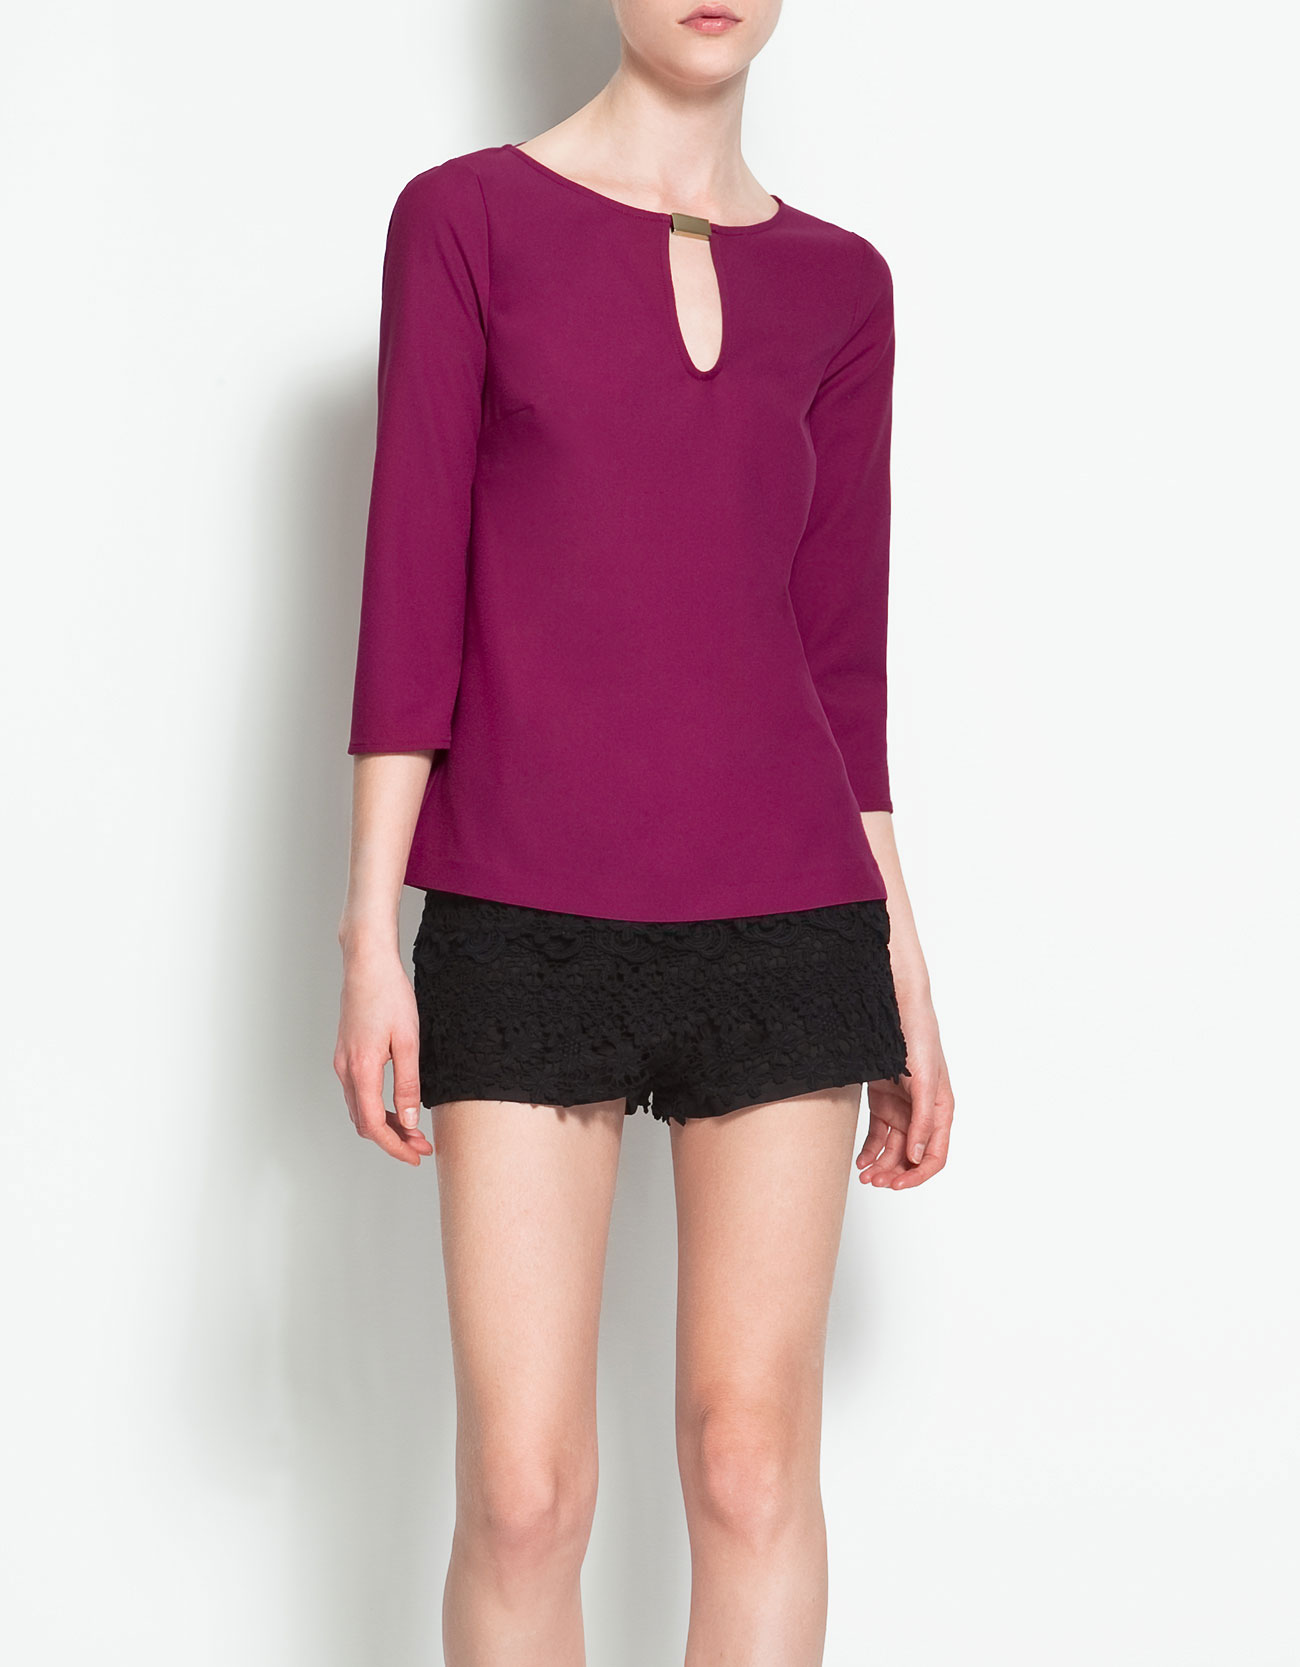 Zara Purple Blouse 44